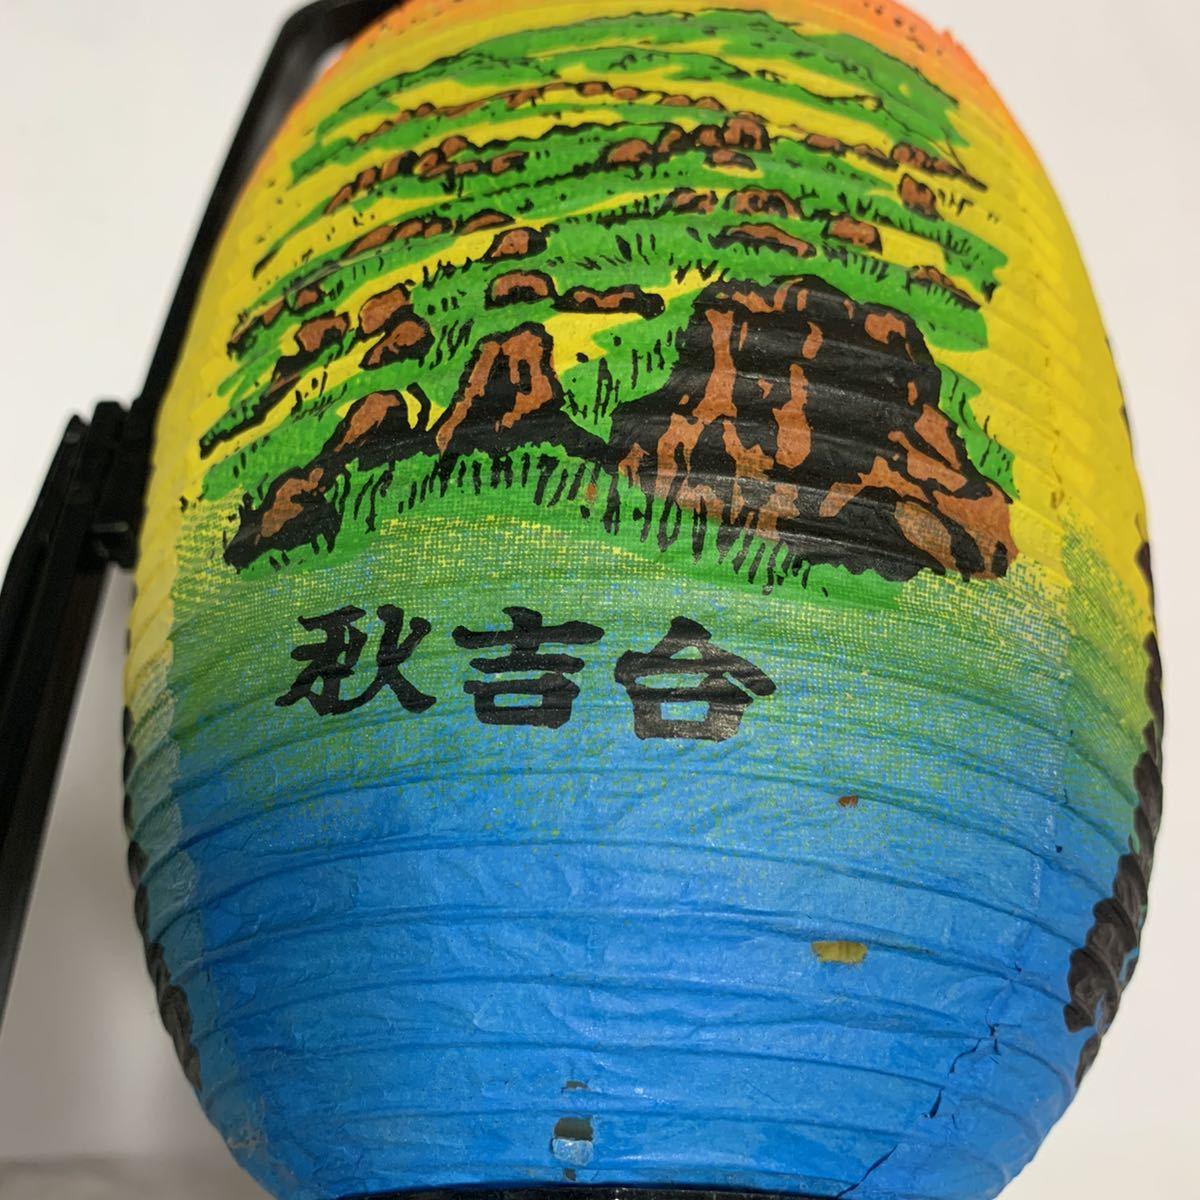 昭和 レトロ 民芸 観光 土産 ご当地 提灯 山口県 秋吉台 秋芳洞_画像3